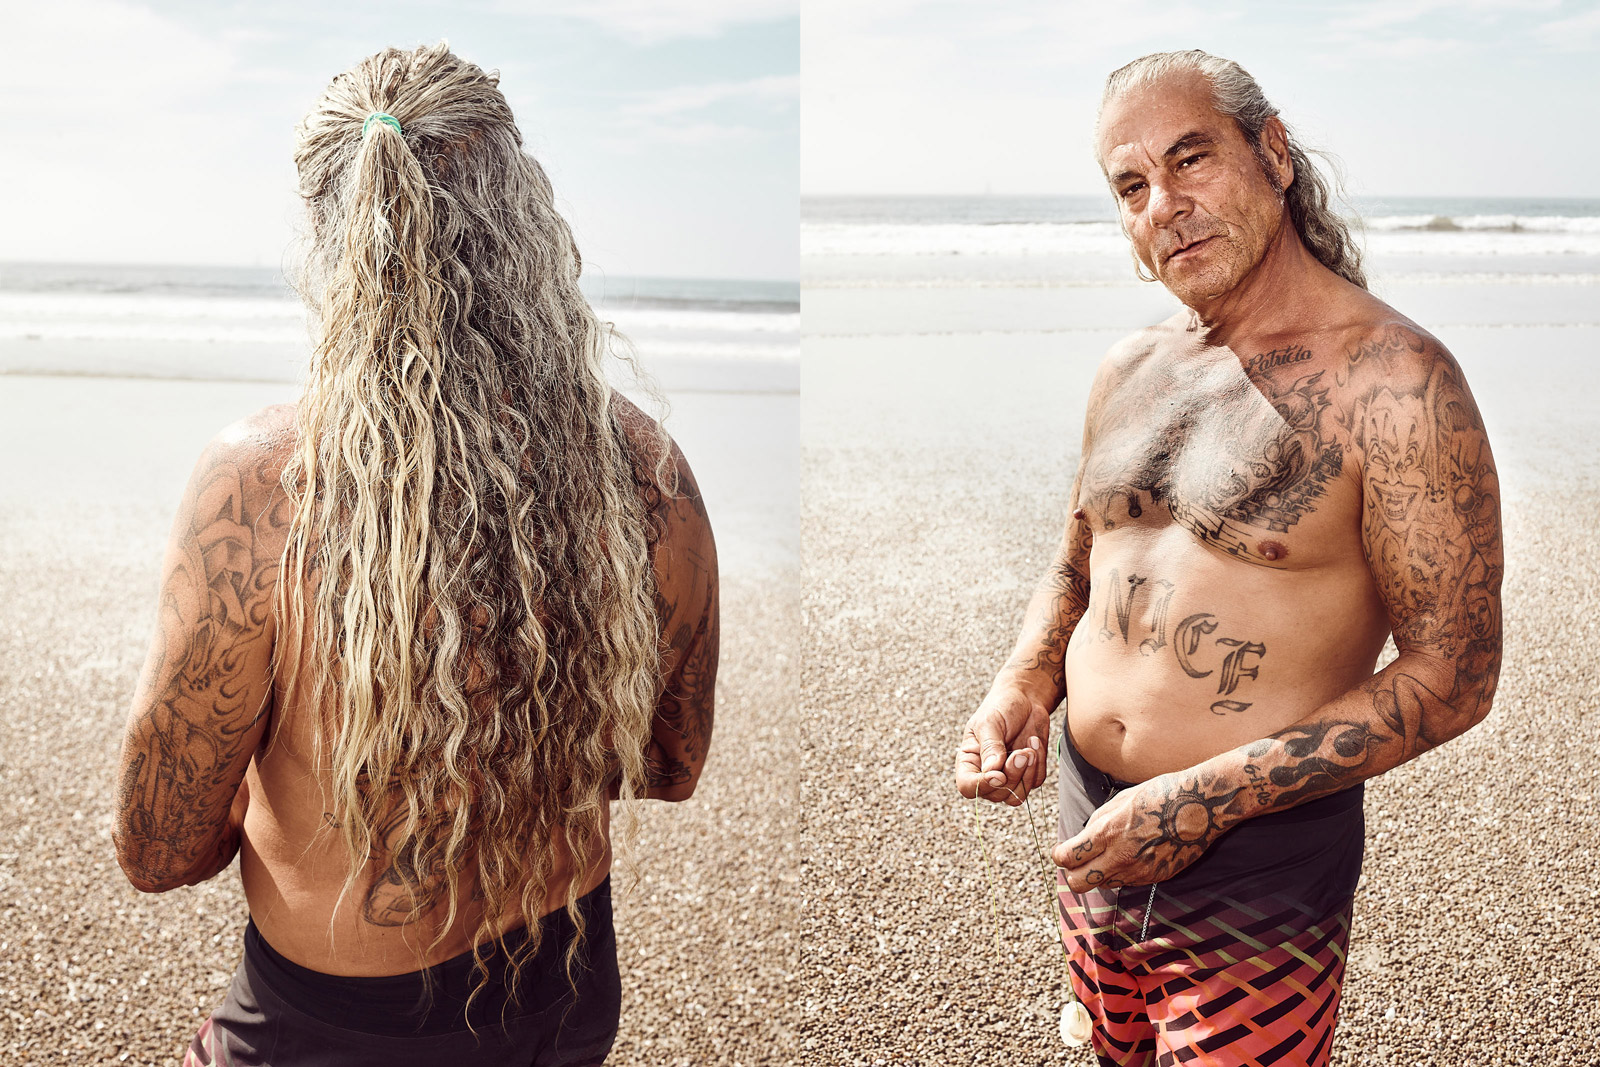 Portrait - Venice Beach Los Angeles USA 2018